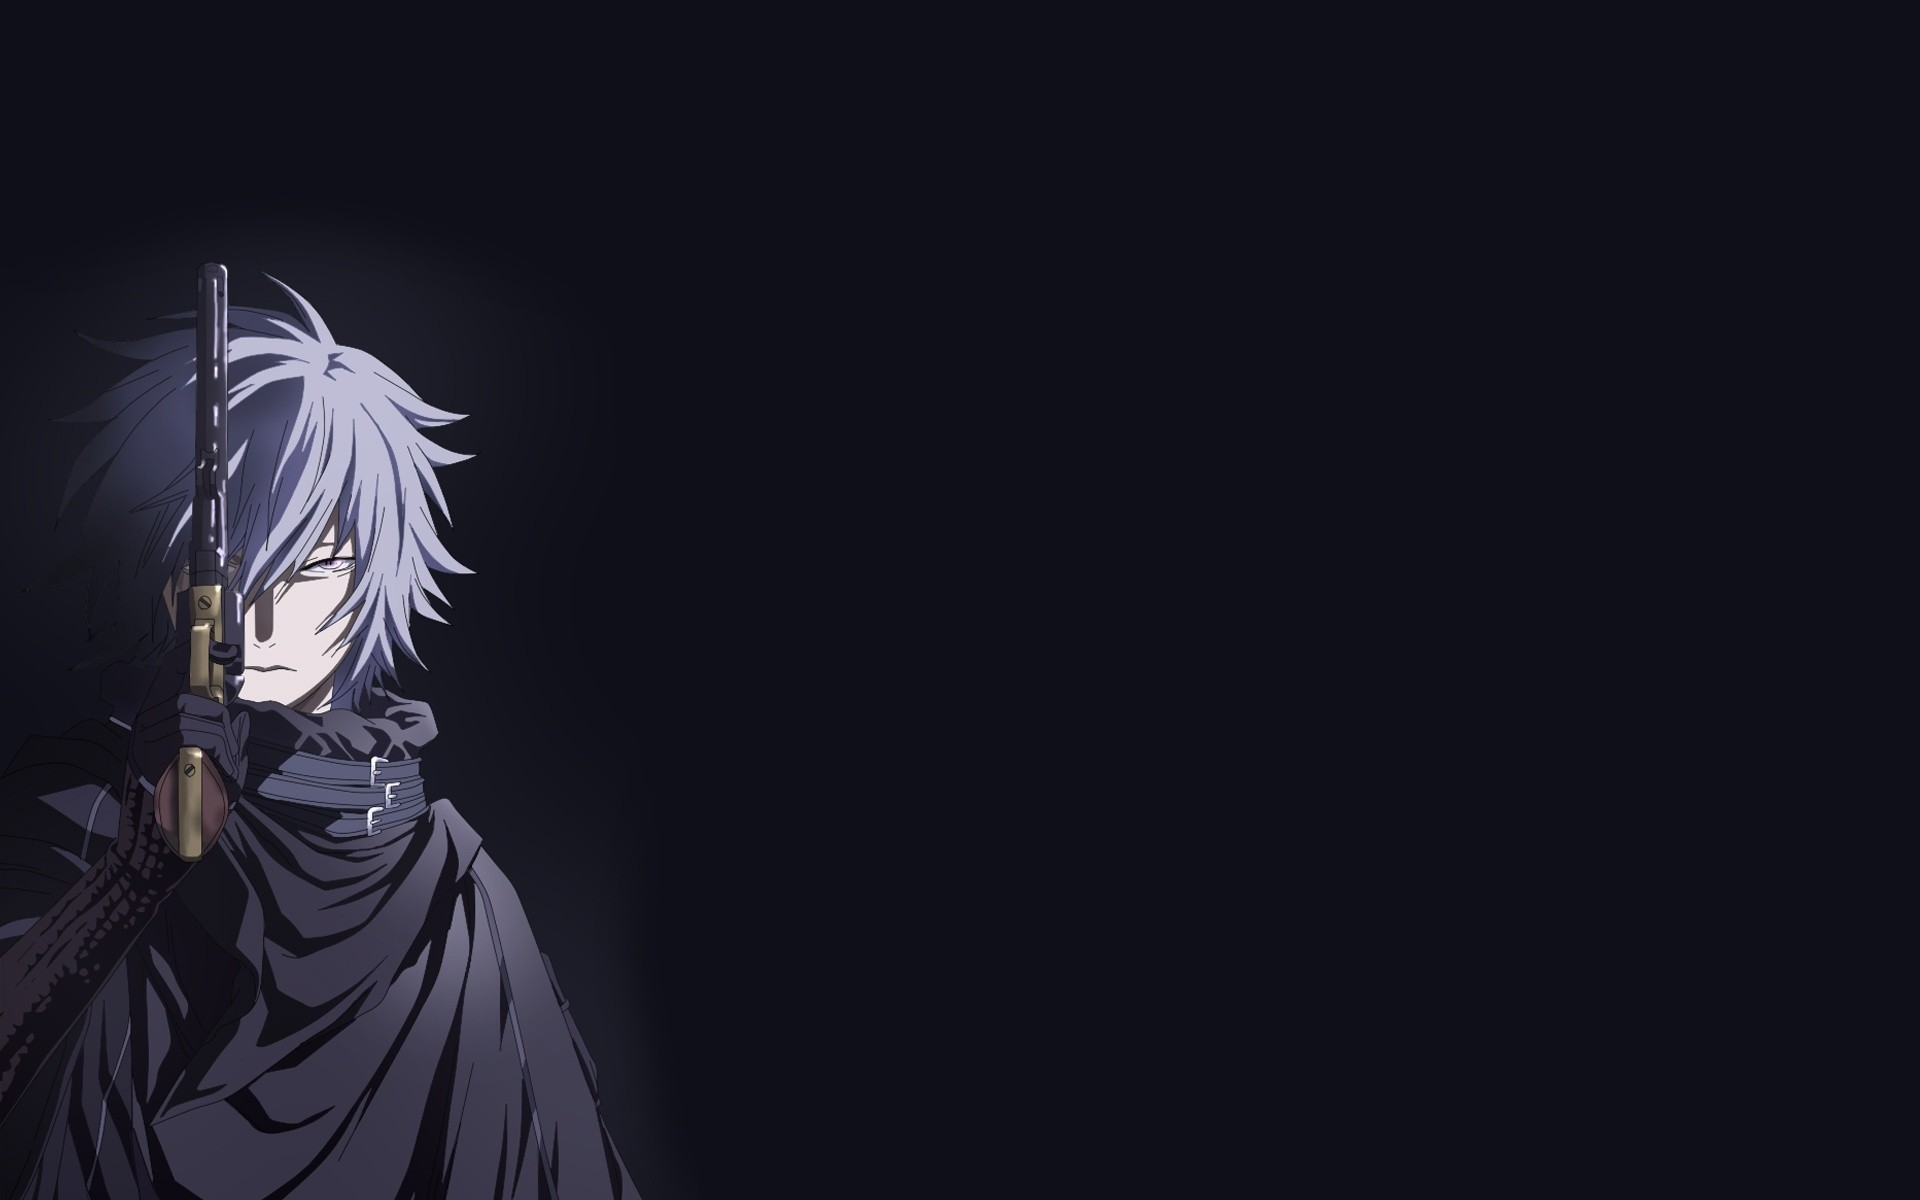 Tegami Bachi Dark Anime Hd Wallpaper #6105 Wallpaper | Wallpaper hd